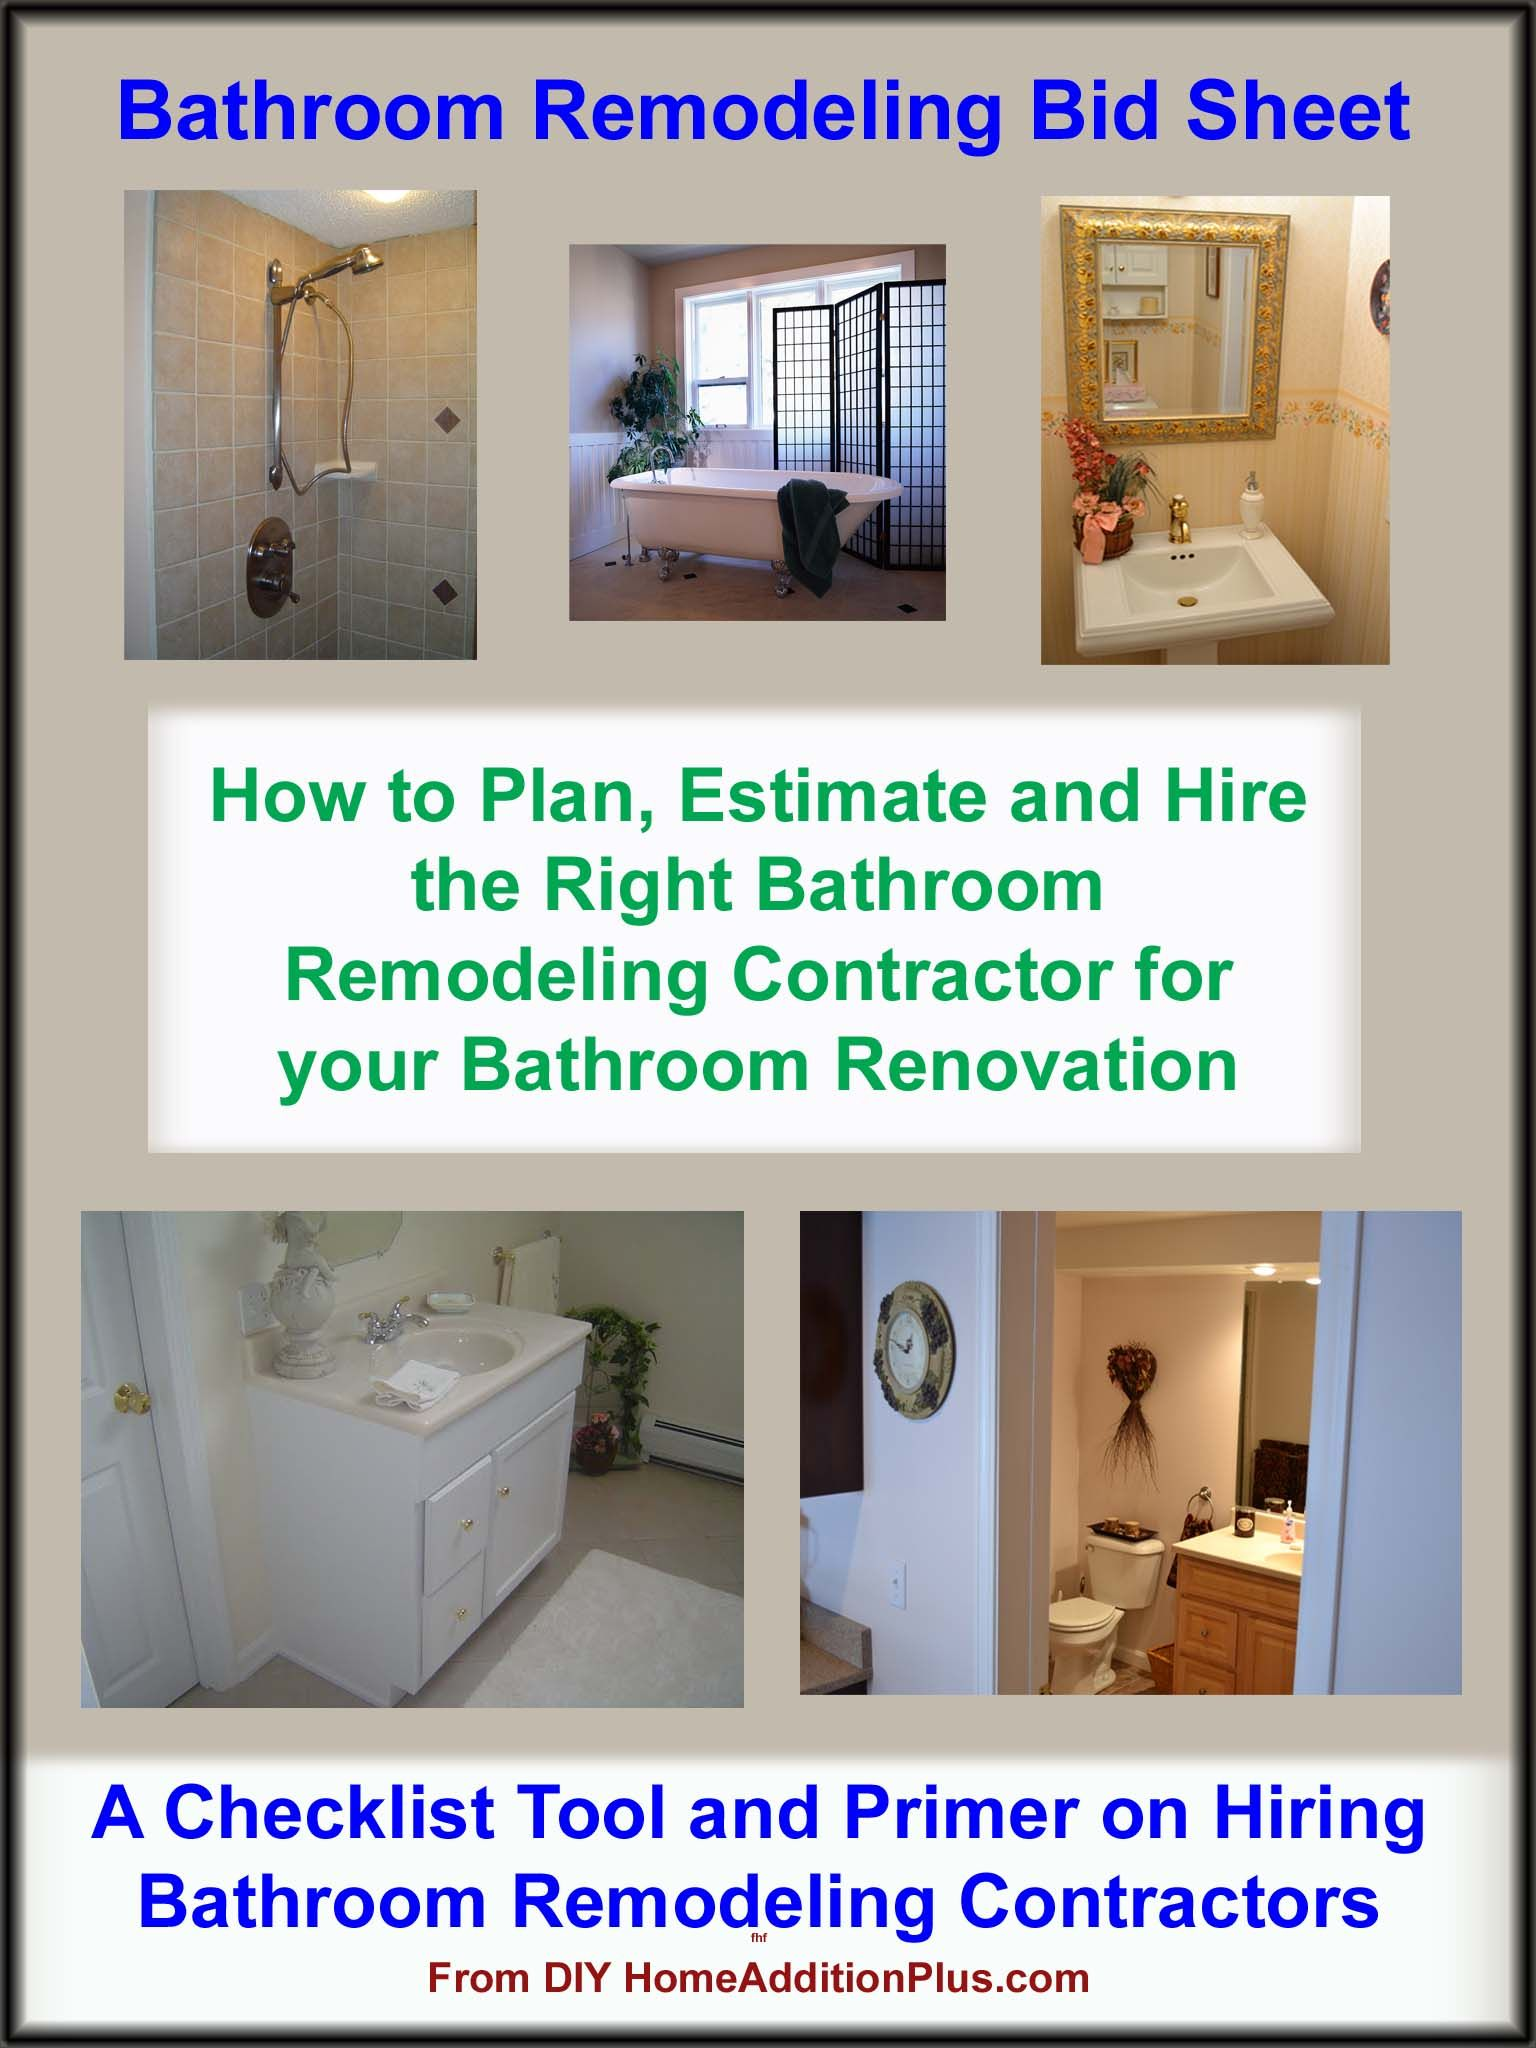 Here Is A Bathroom Remodeling Bid Sheet For Helping Homeowners